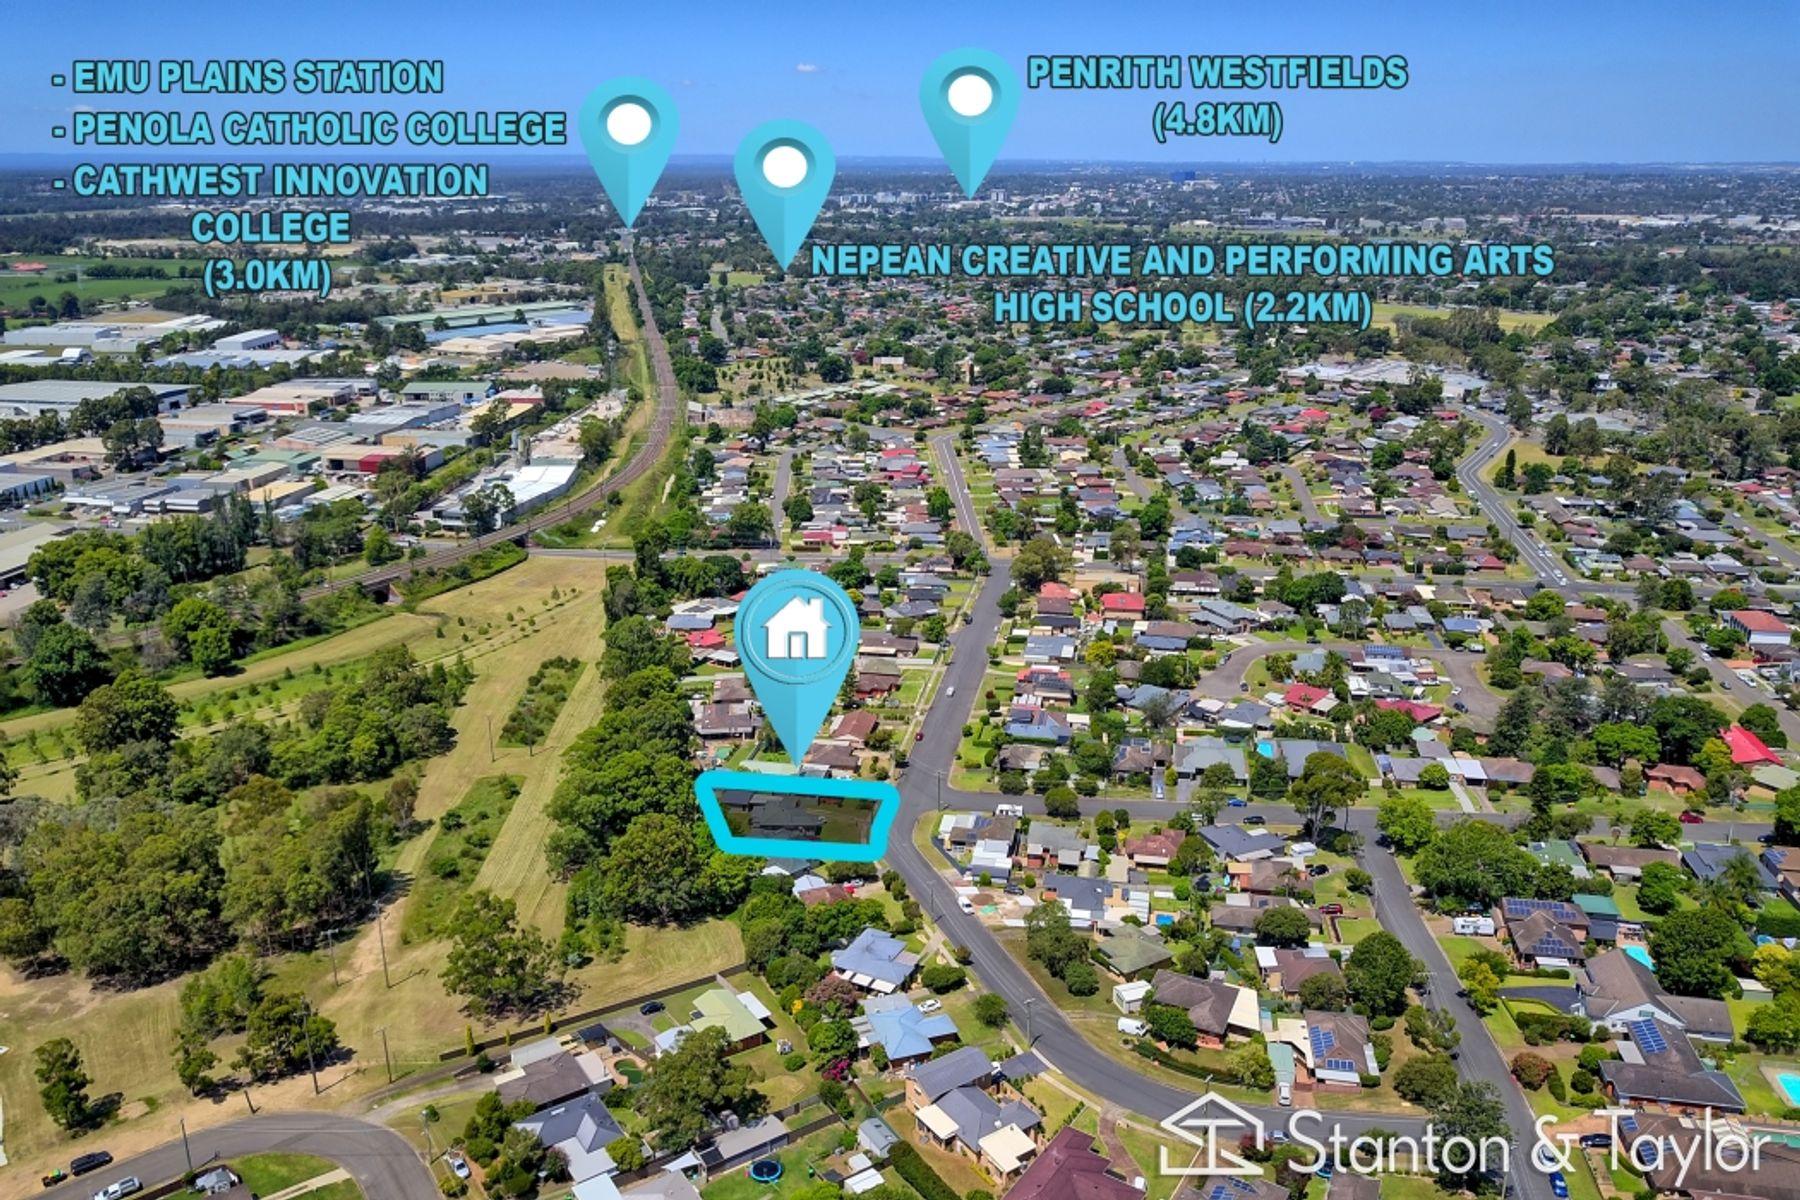 101 Pyramid Street, Emu Plains, NSW 2750